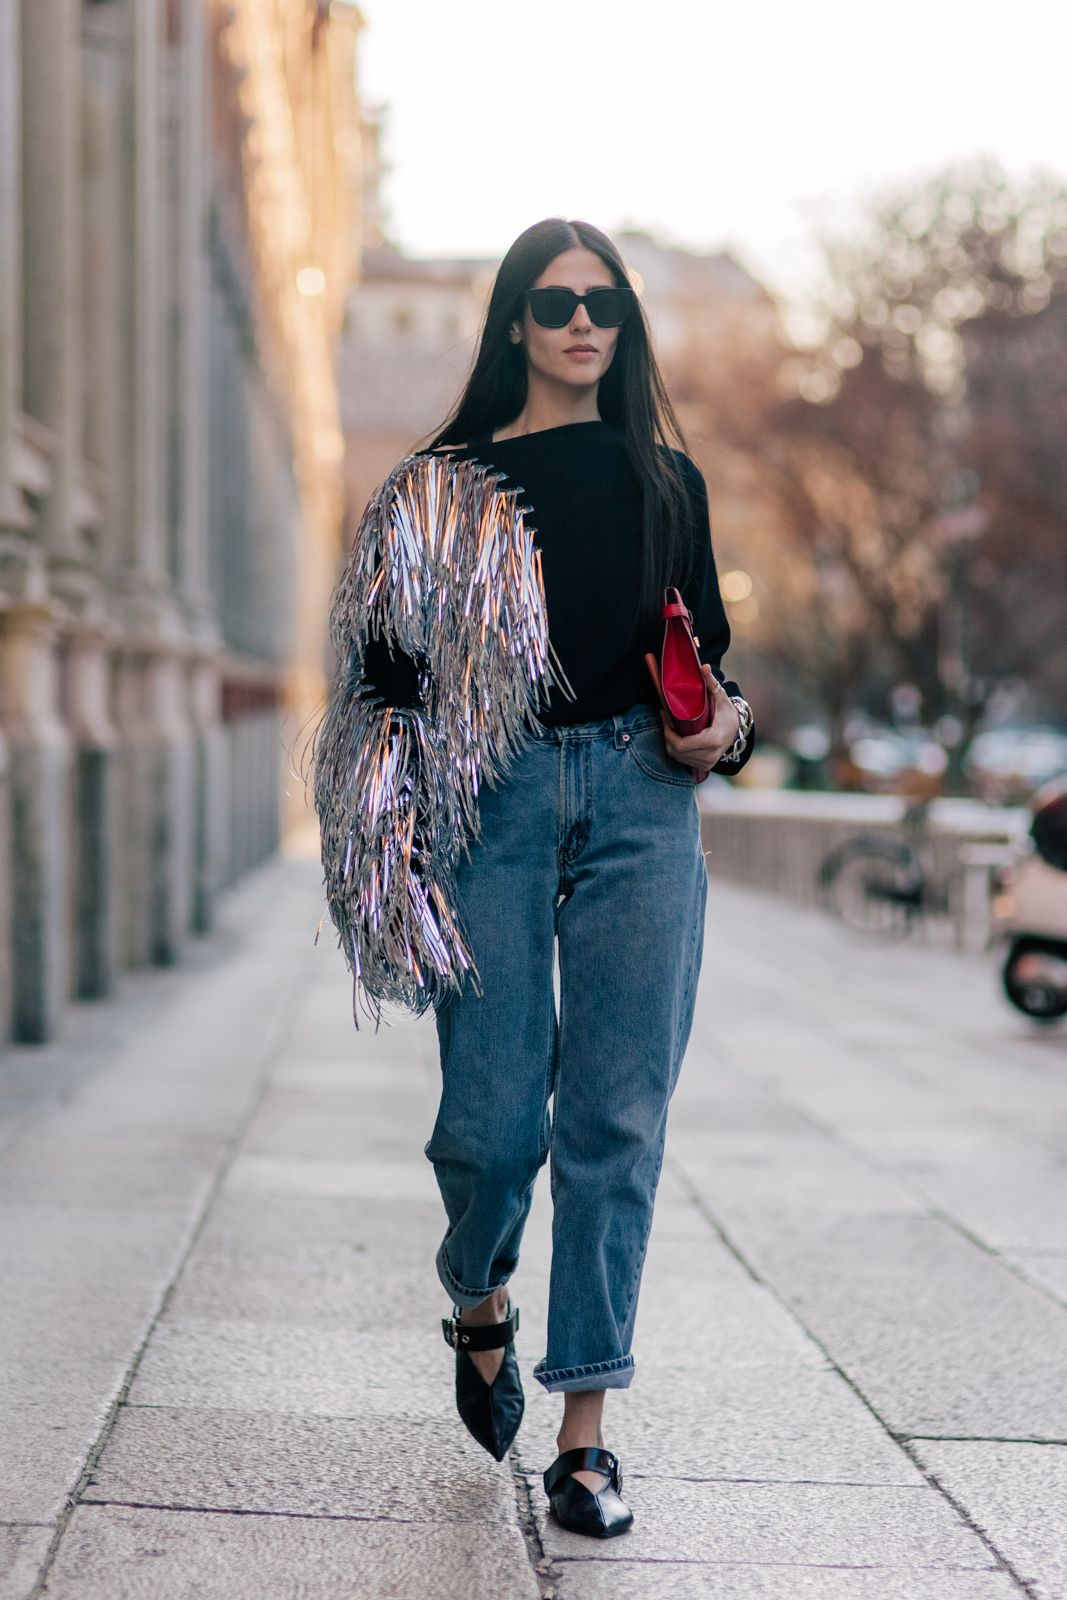 Gilda Ambrosio wearing a Loewe sweater and Celine shoes ...